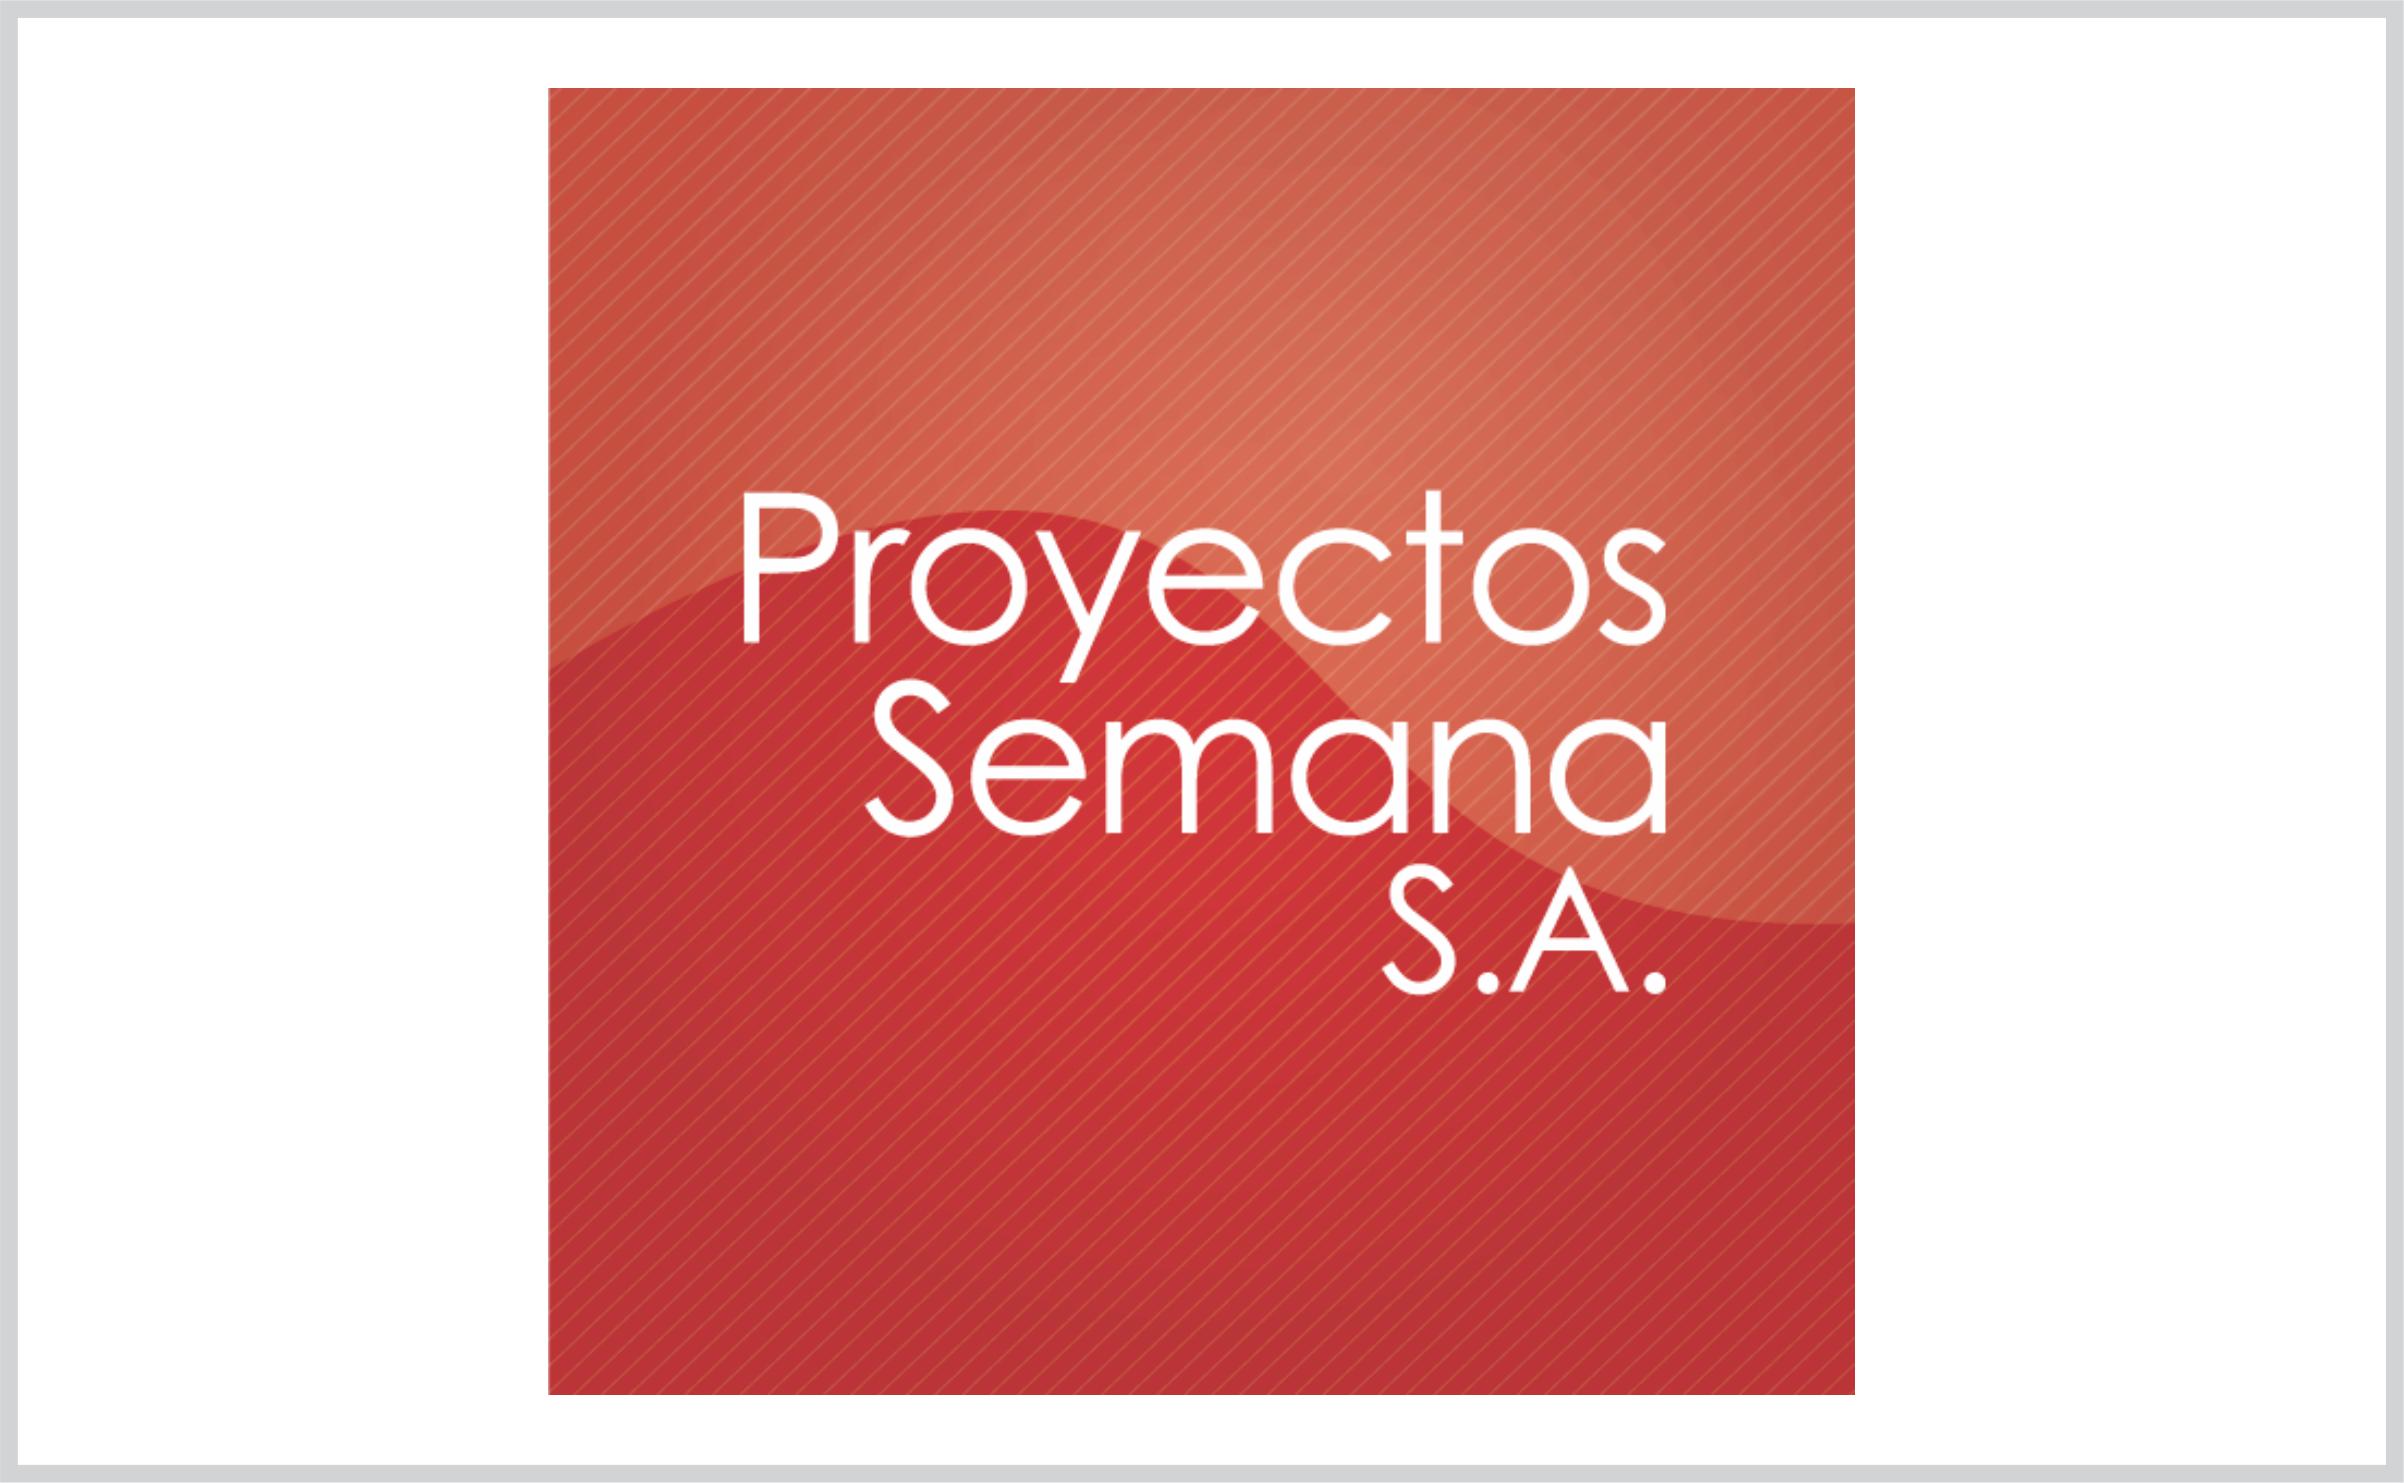 Proyectos Semana